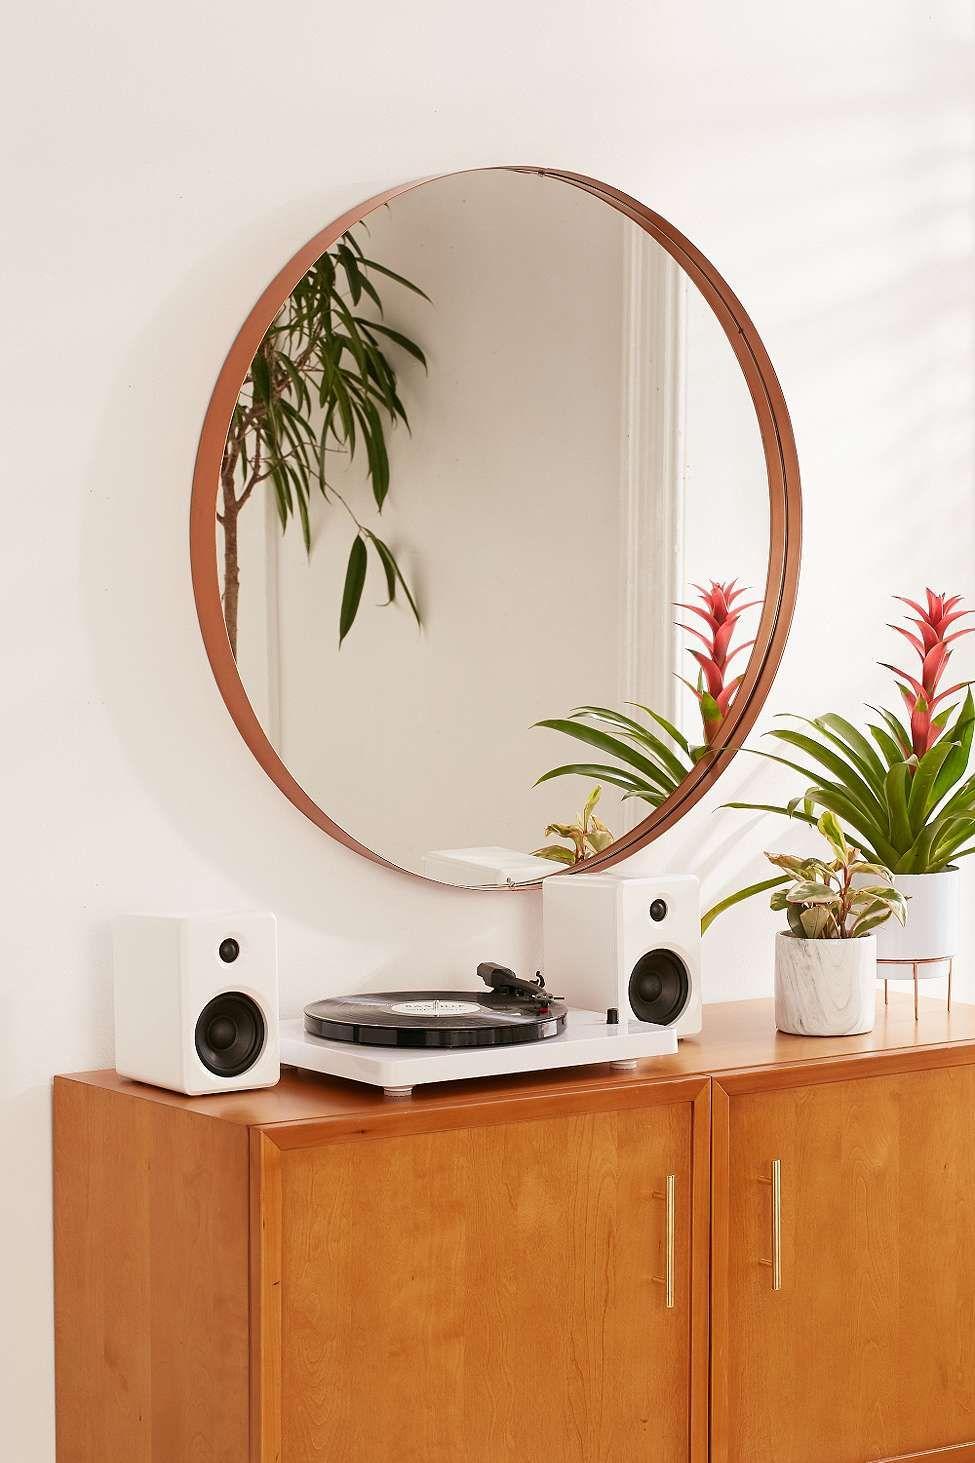 Internal Affairs Interior Designers: Large Circle Mirror, Copper Home